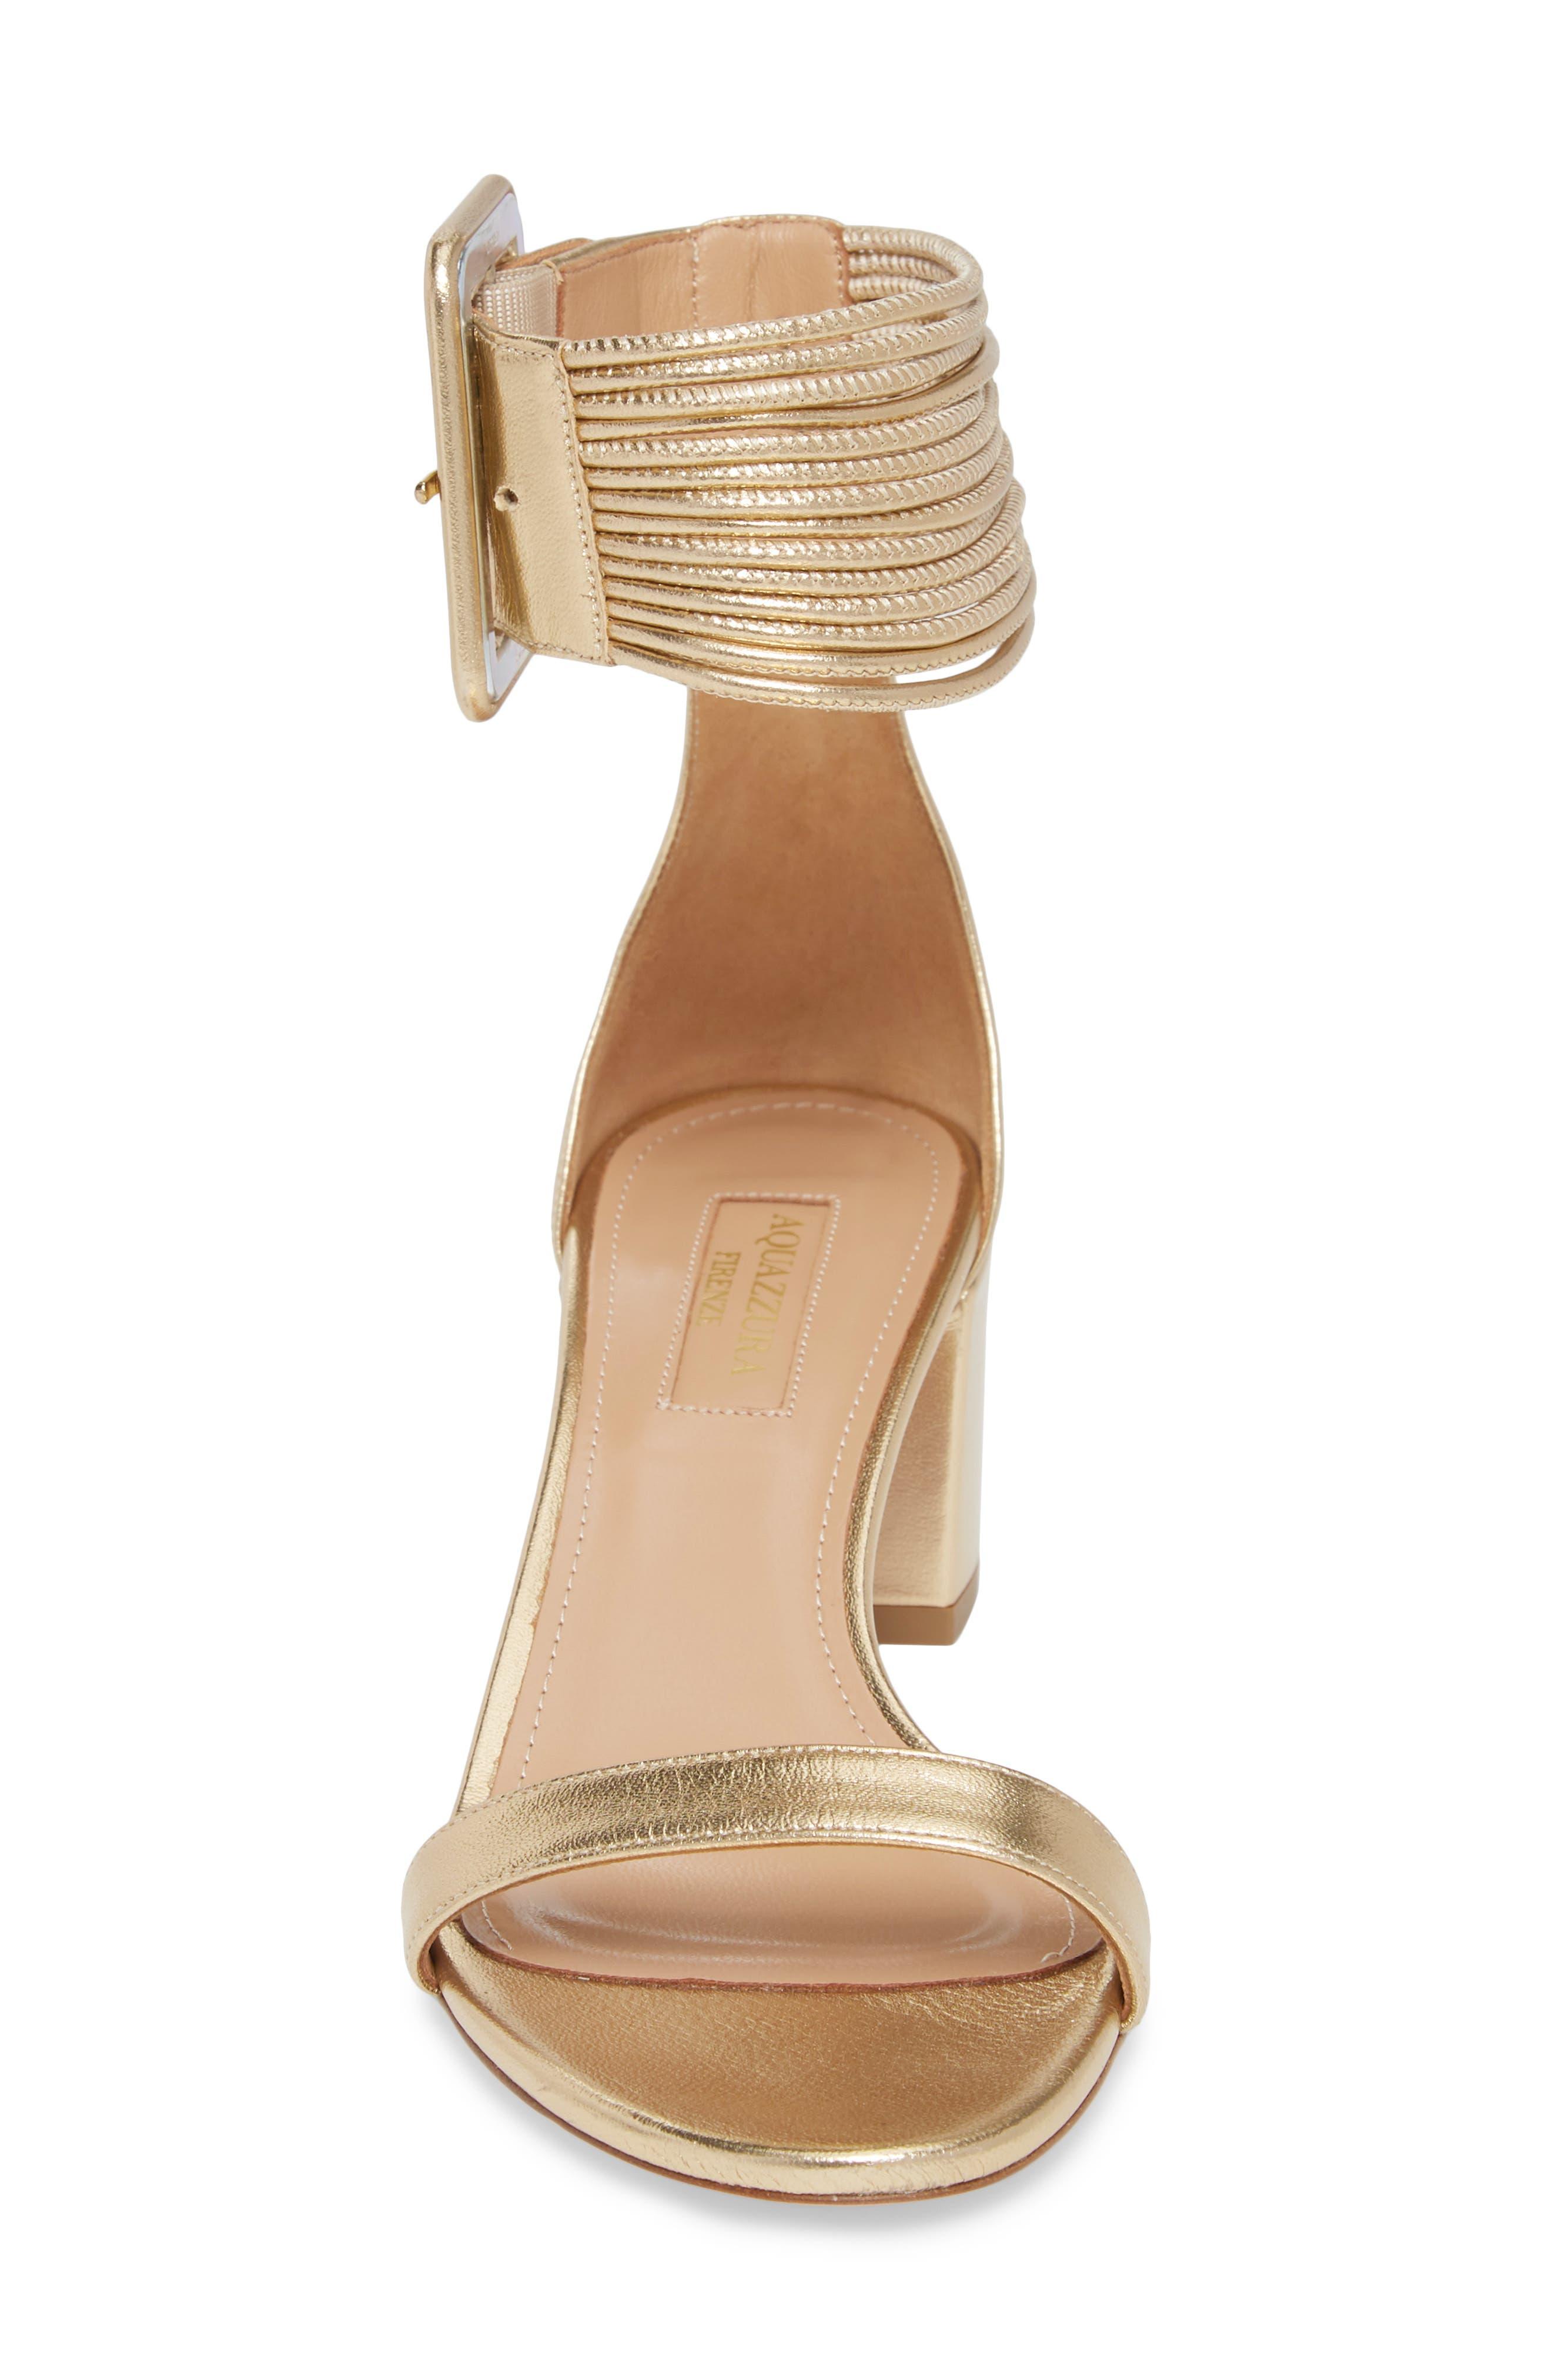 Casablanca Ankle Cuff Sandal,                             Alternate thumbnail 4, color,                             Soft Gold